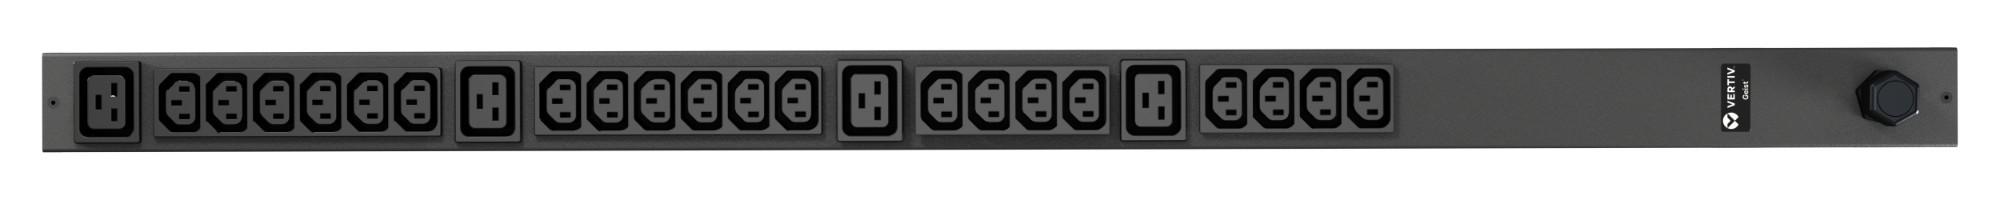 Vertiv Geist rPDU, basic, 0U, input IEC60309 230V 16A, outputs (20)C13 | (4)C19 unidad de distribución de energía (PDU) Negro 24 salidas AC